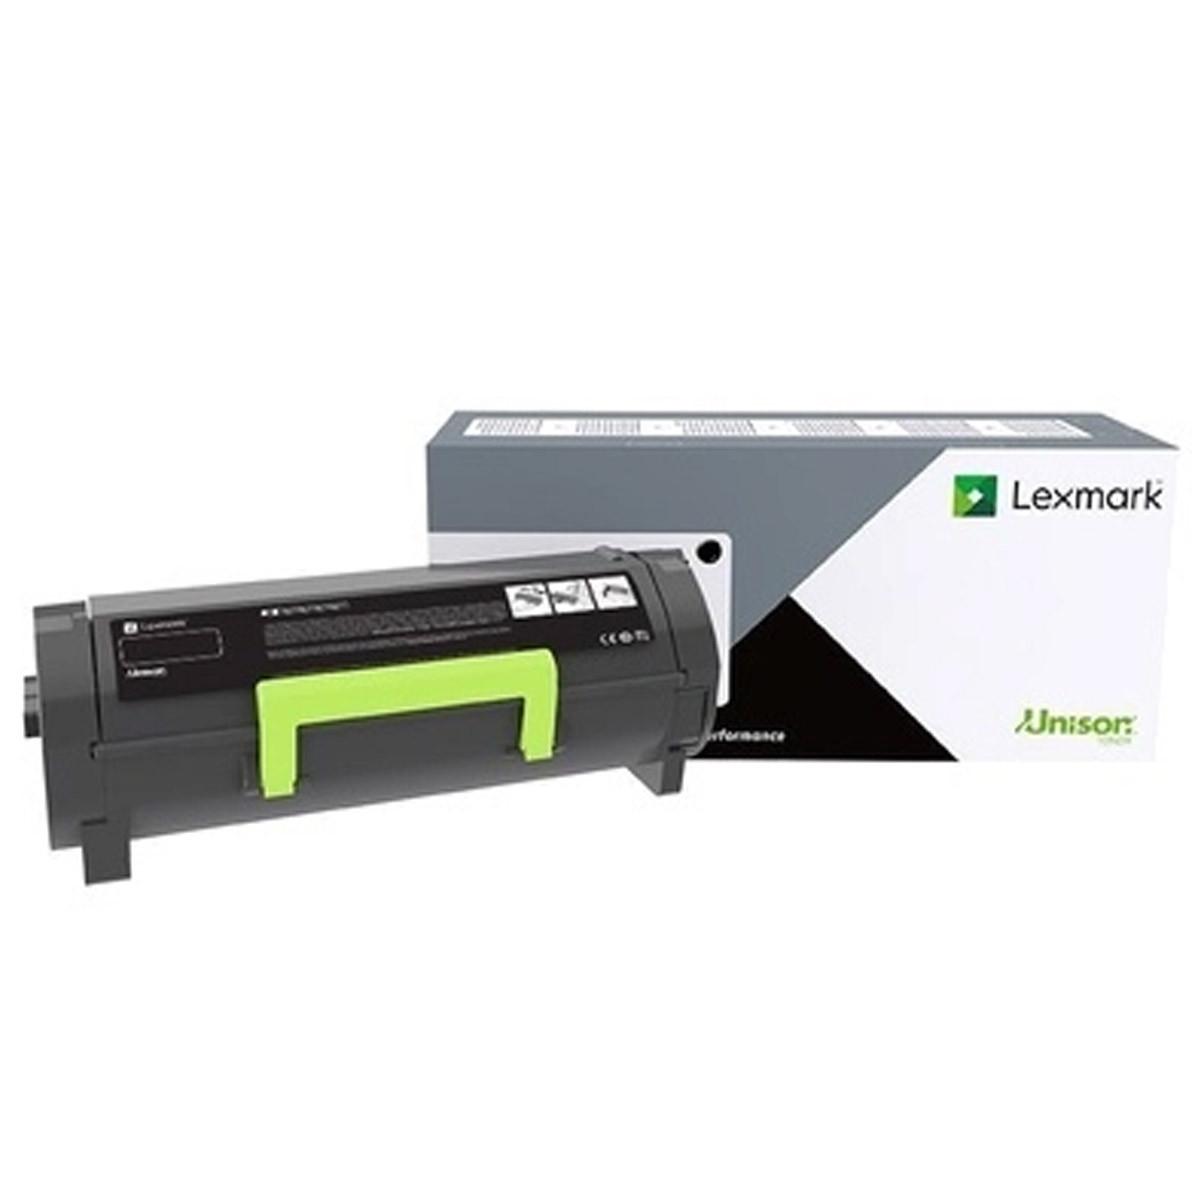 Toner Lexmark 56F4X00 56FBX00 56F4X 56FBX   MS521 MX521 MS621 MX522 MS622 MX622 MX421   Original 20K